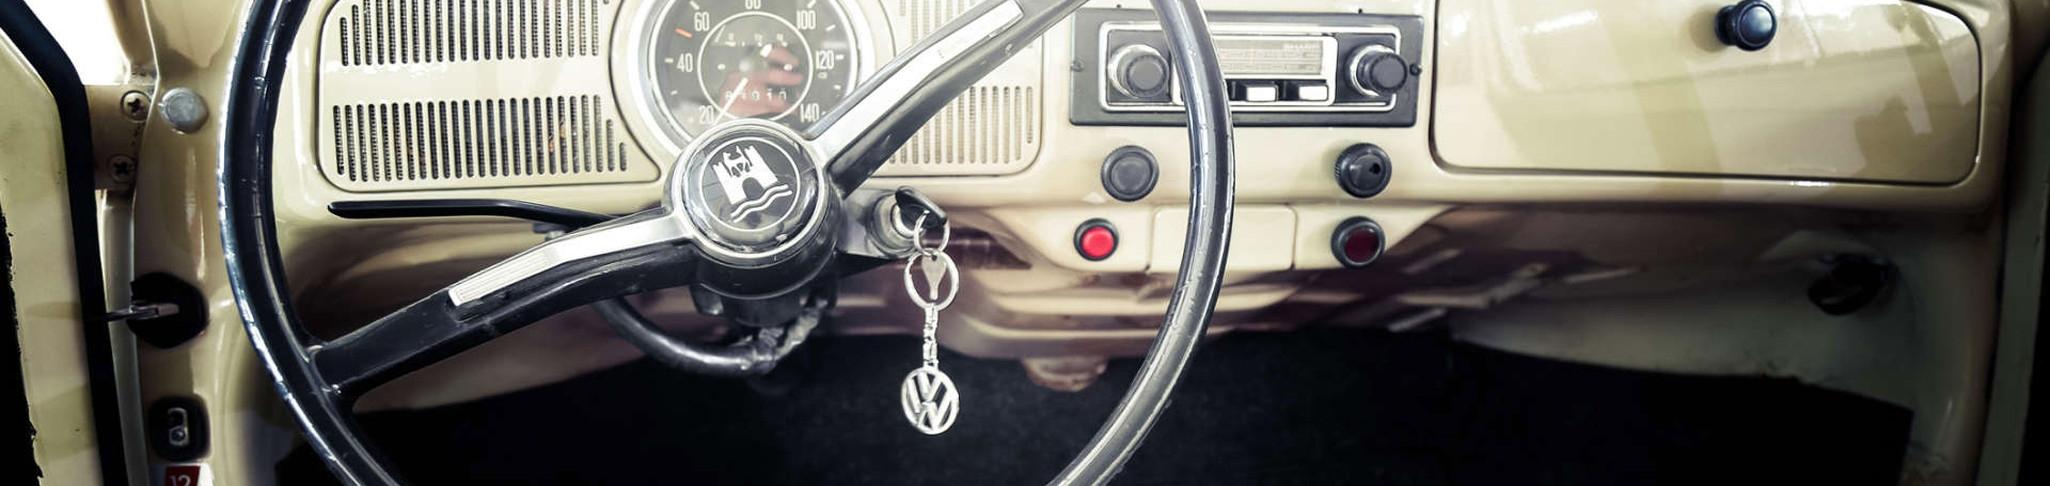 VW Kever onderdelen